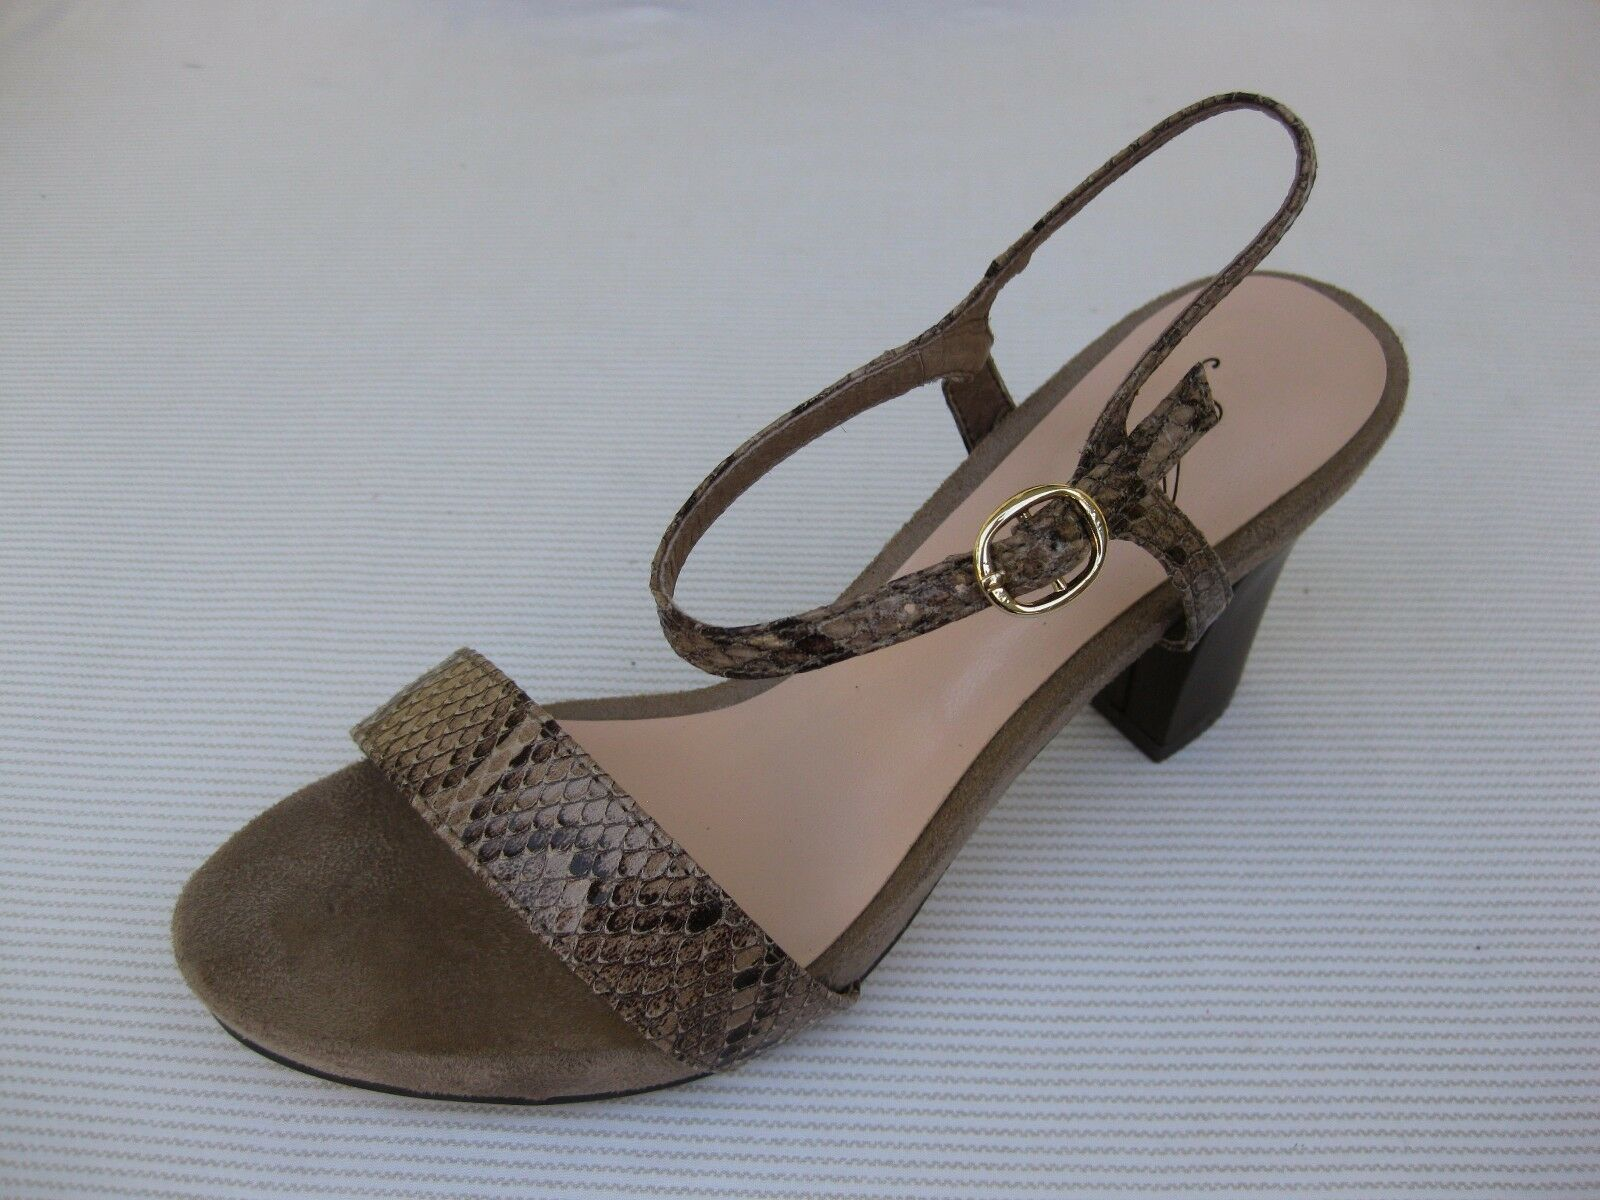 Azura Womens shoes  120 NEW Avezzano Taupe Snake Sandal 38 7.5 8